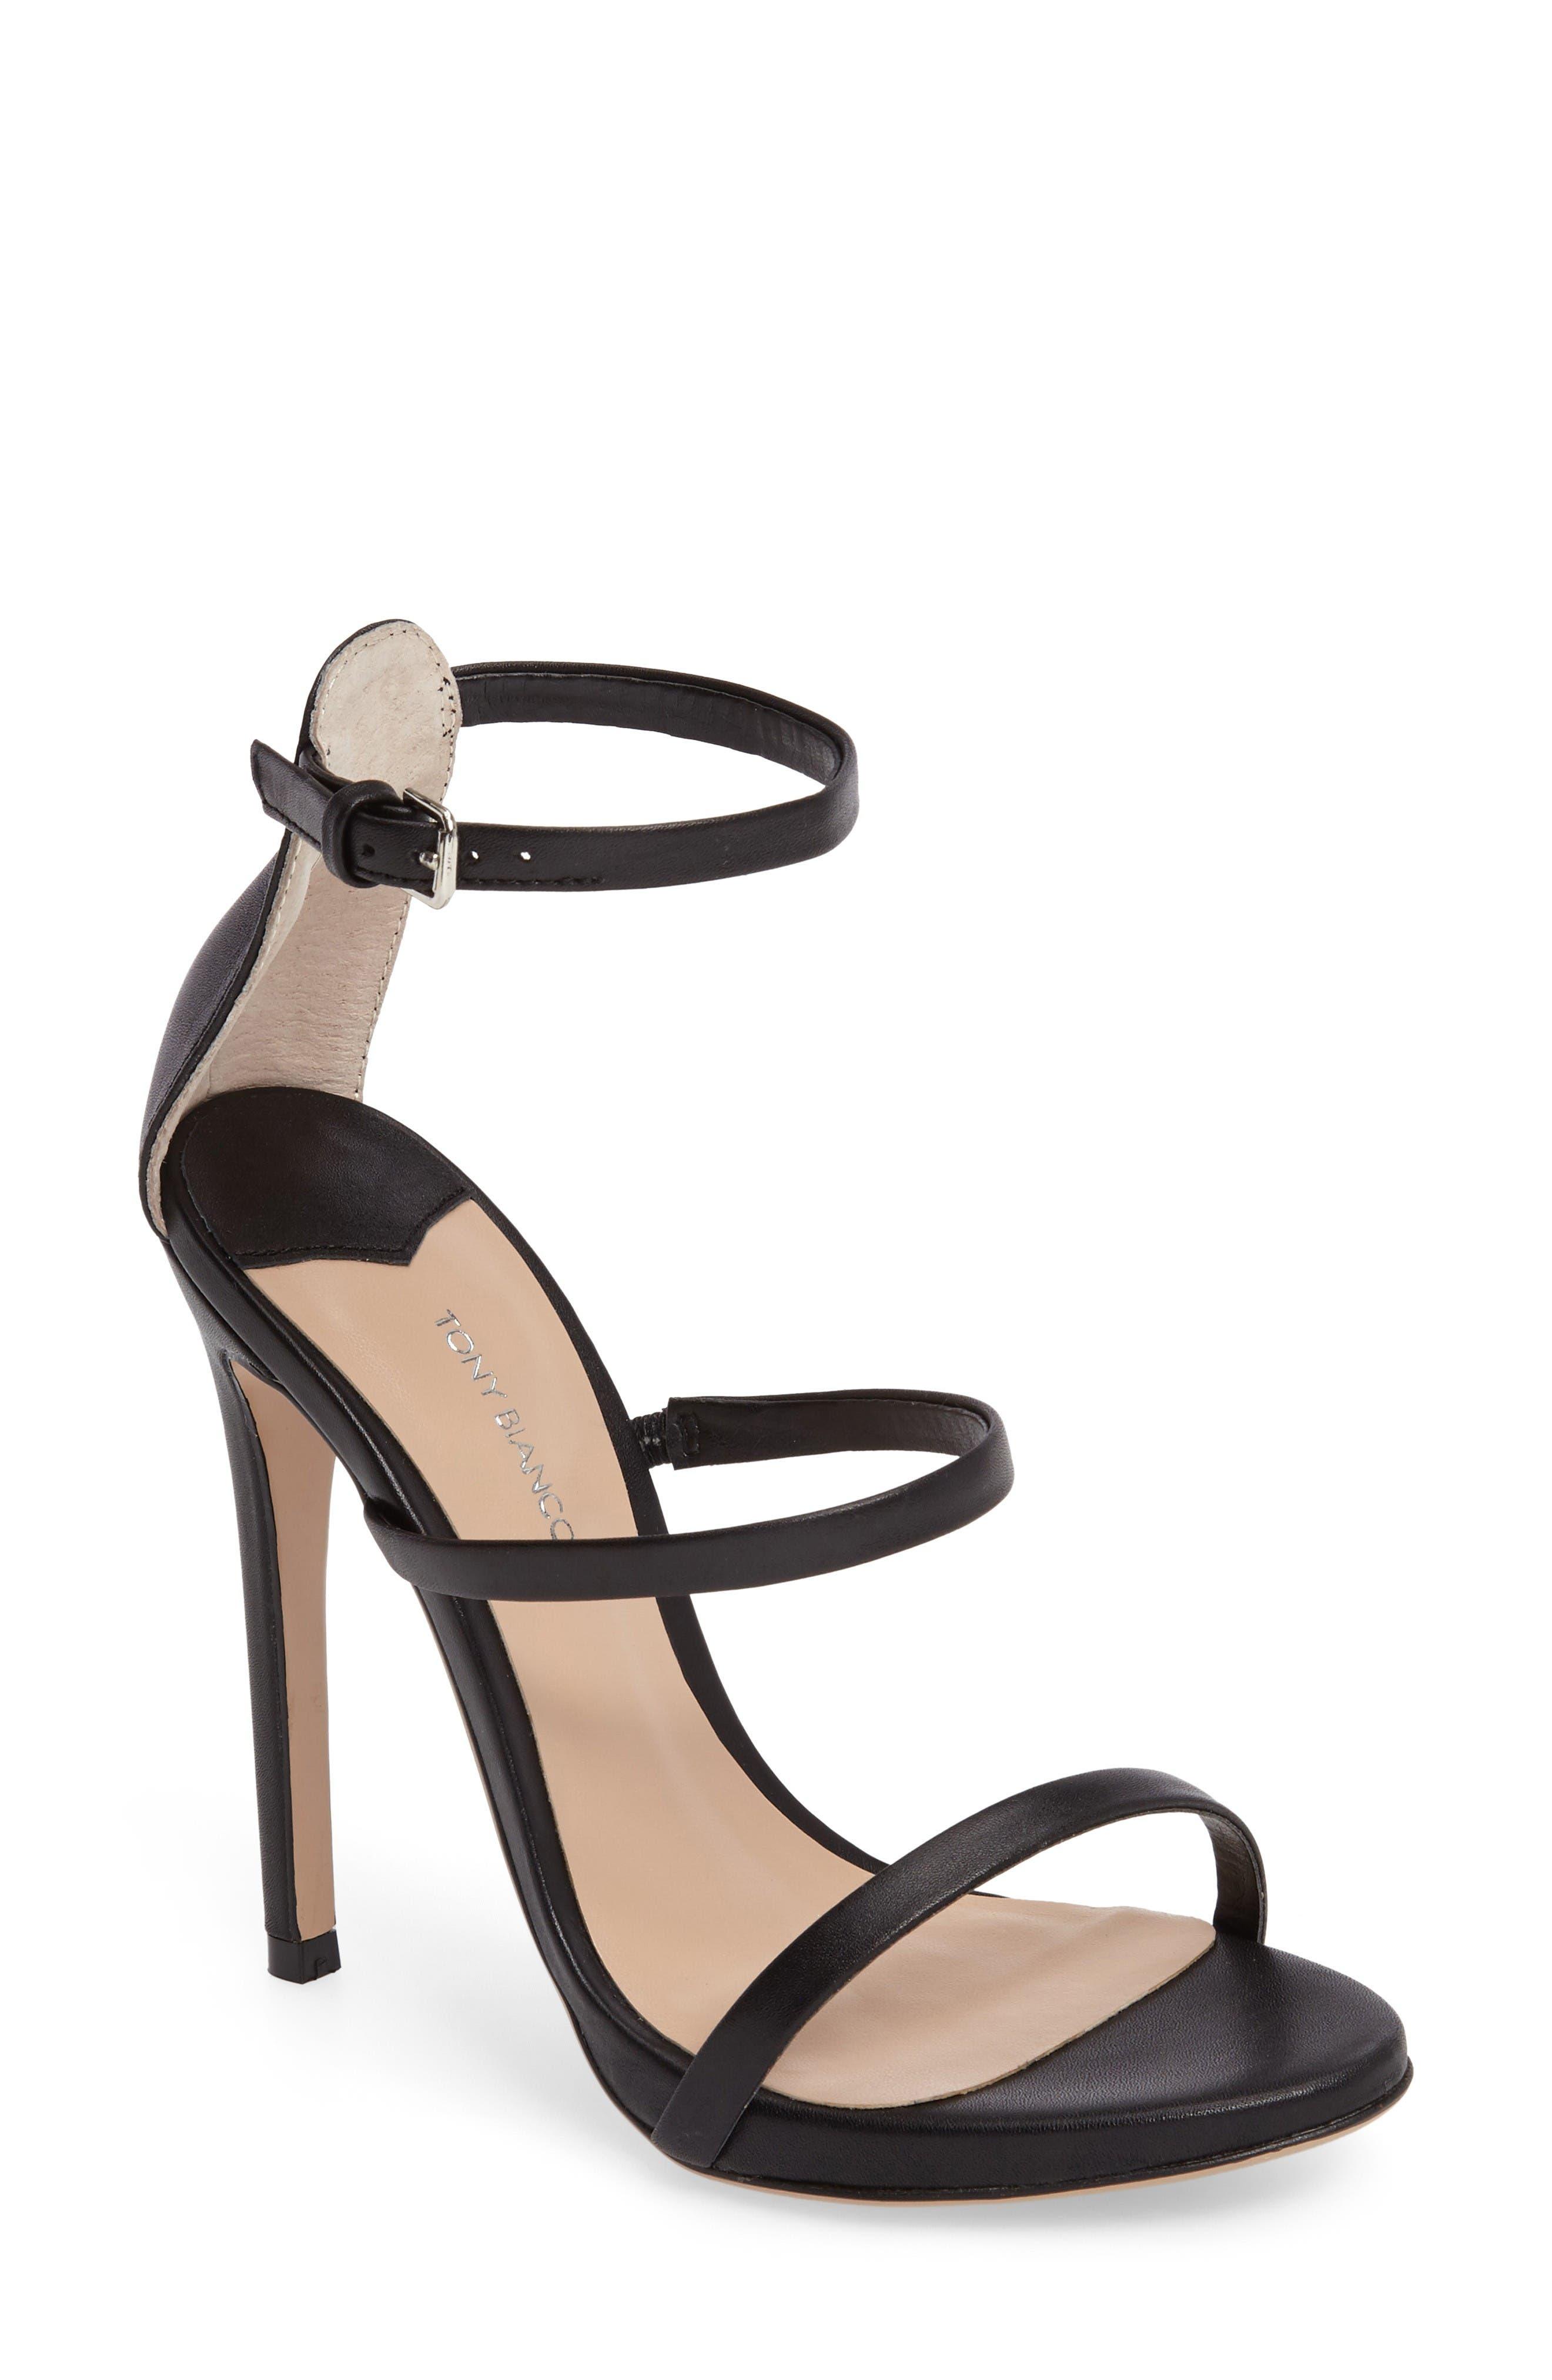 Atkins Sandal,                             Main thumbnail 1, color,                             Black Capretto Leather